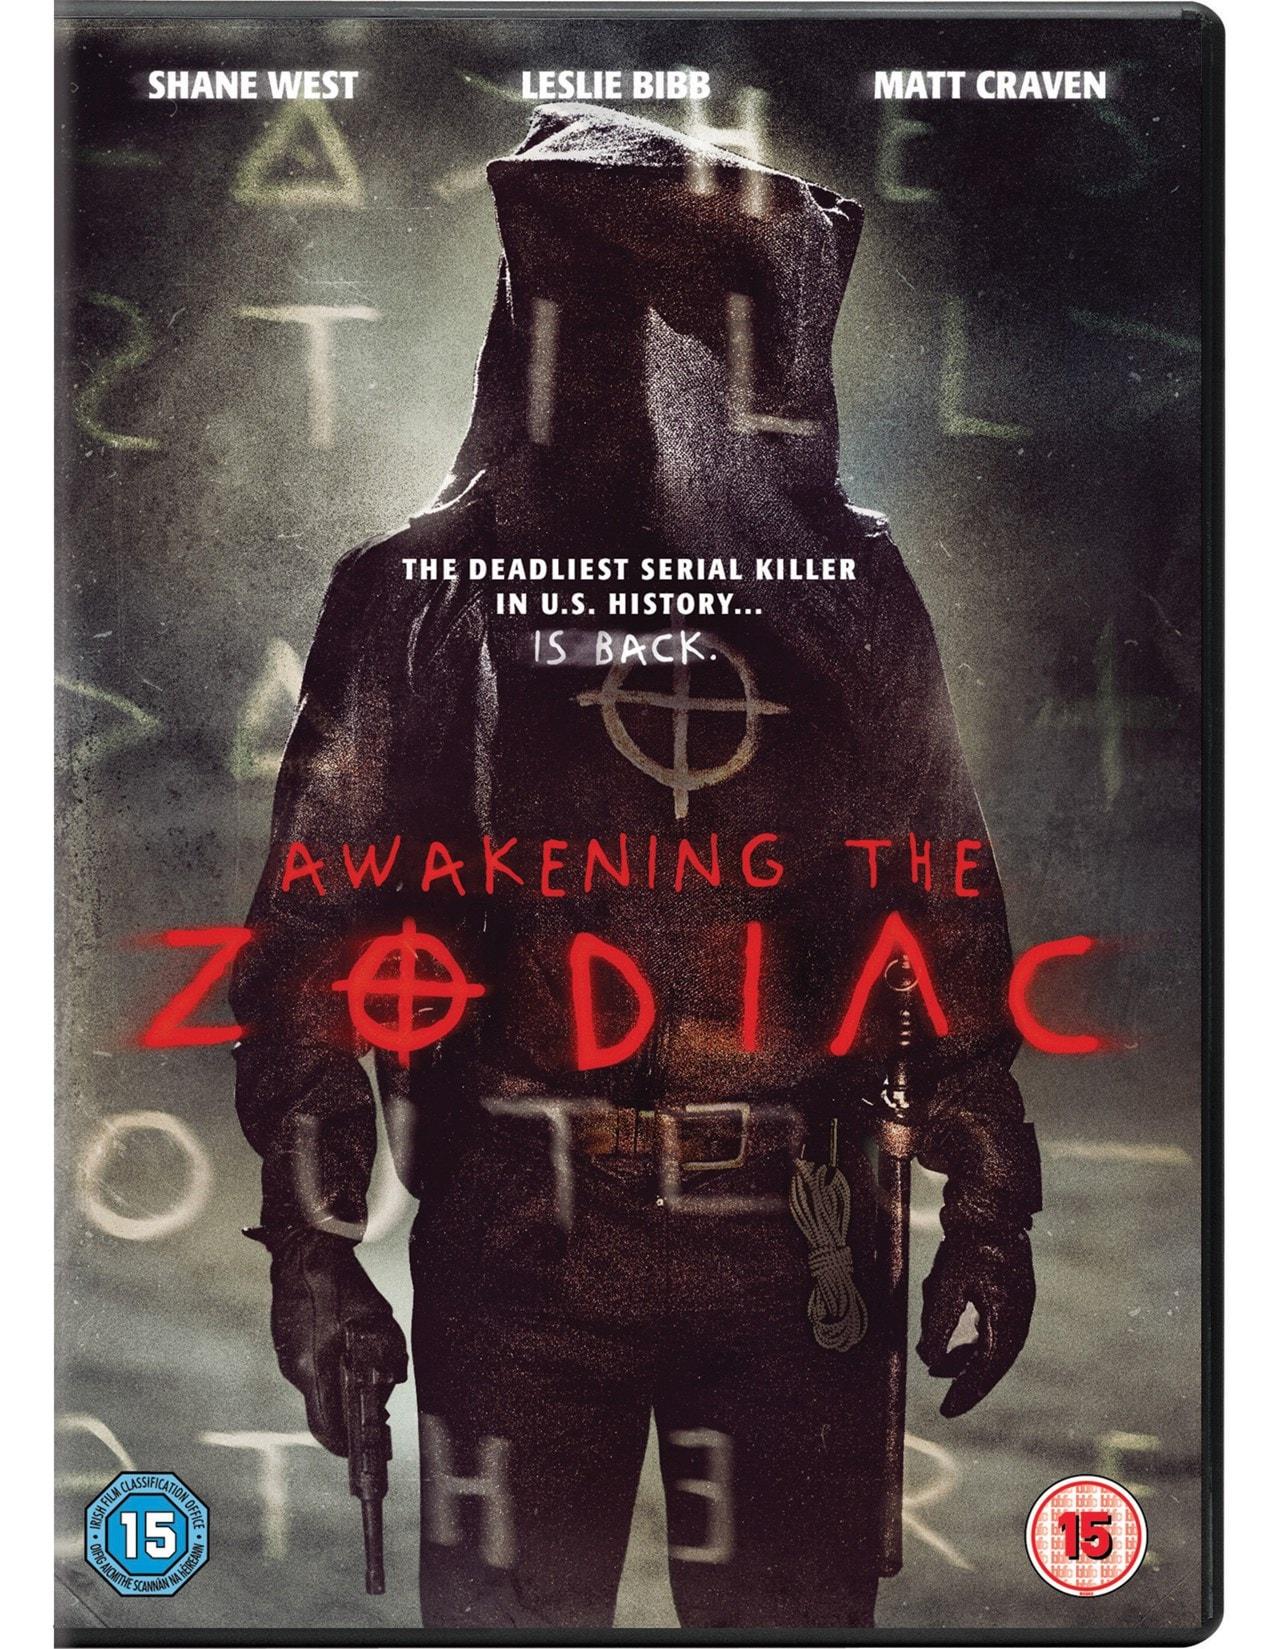 Awakening the Zodiac - 1